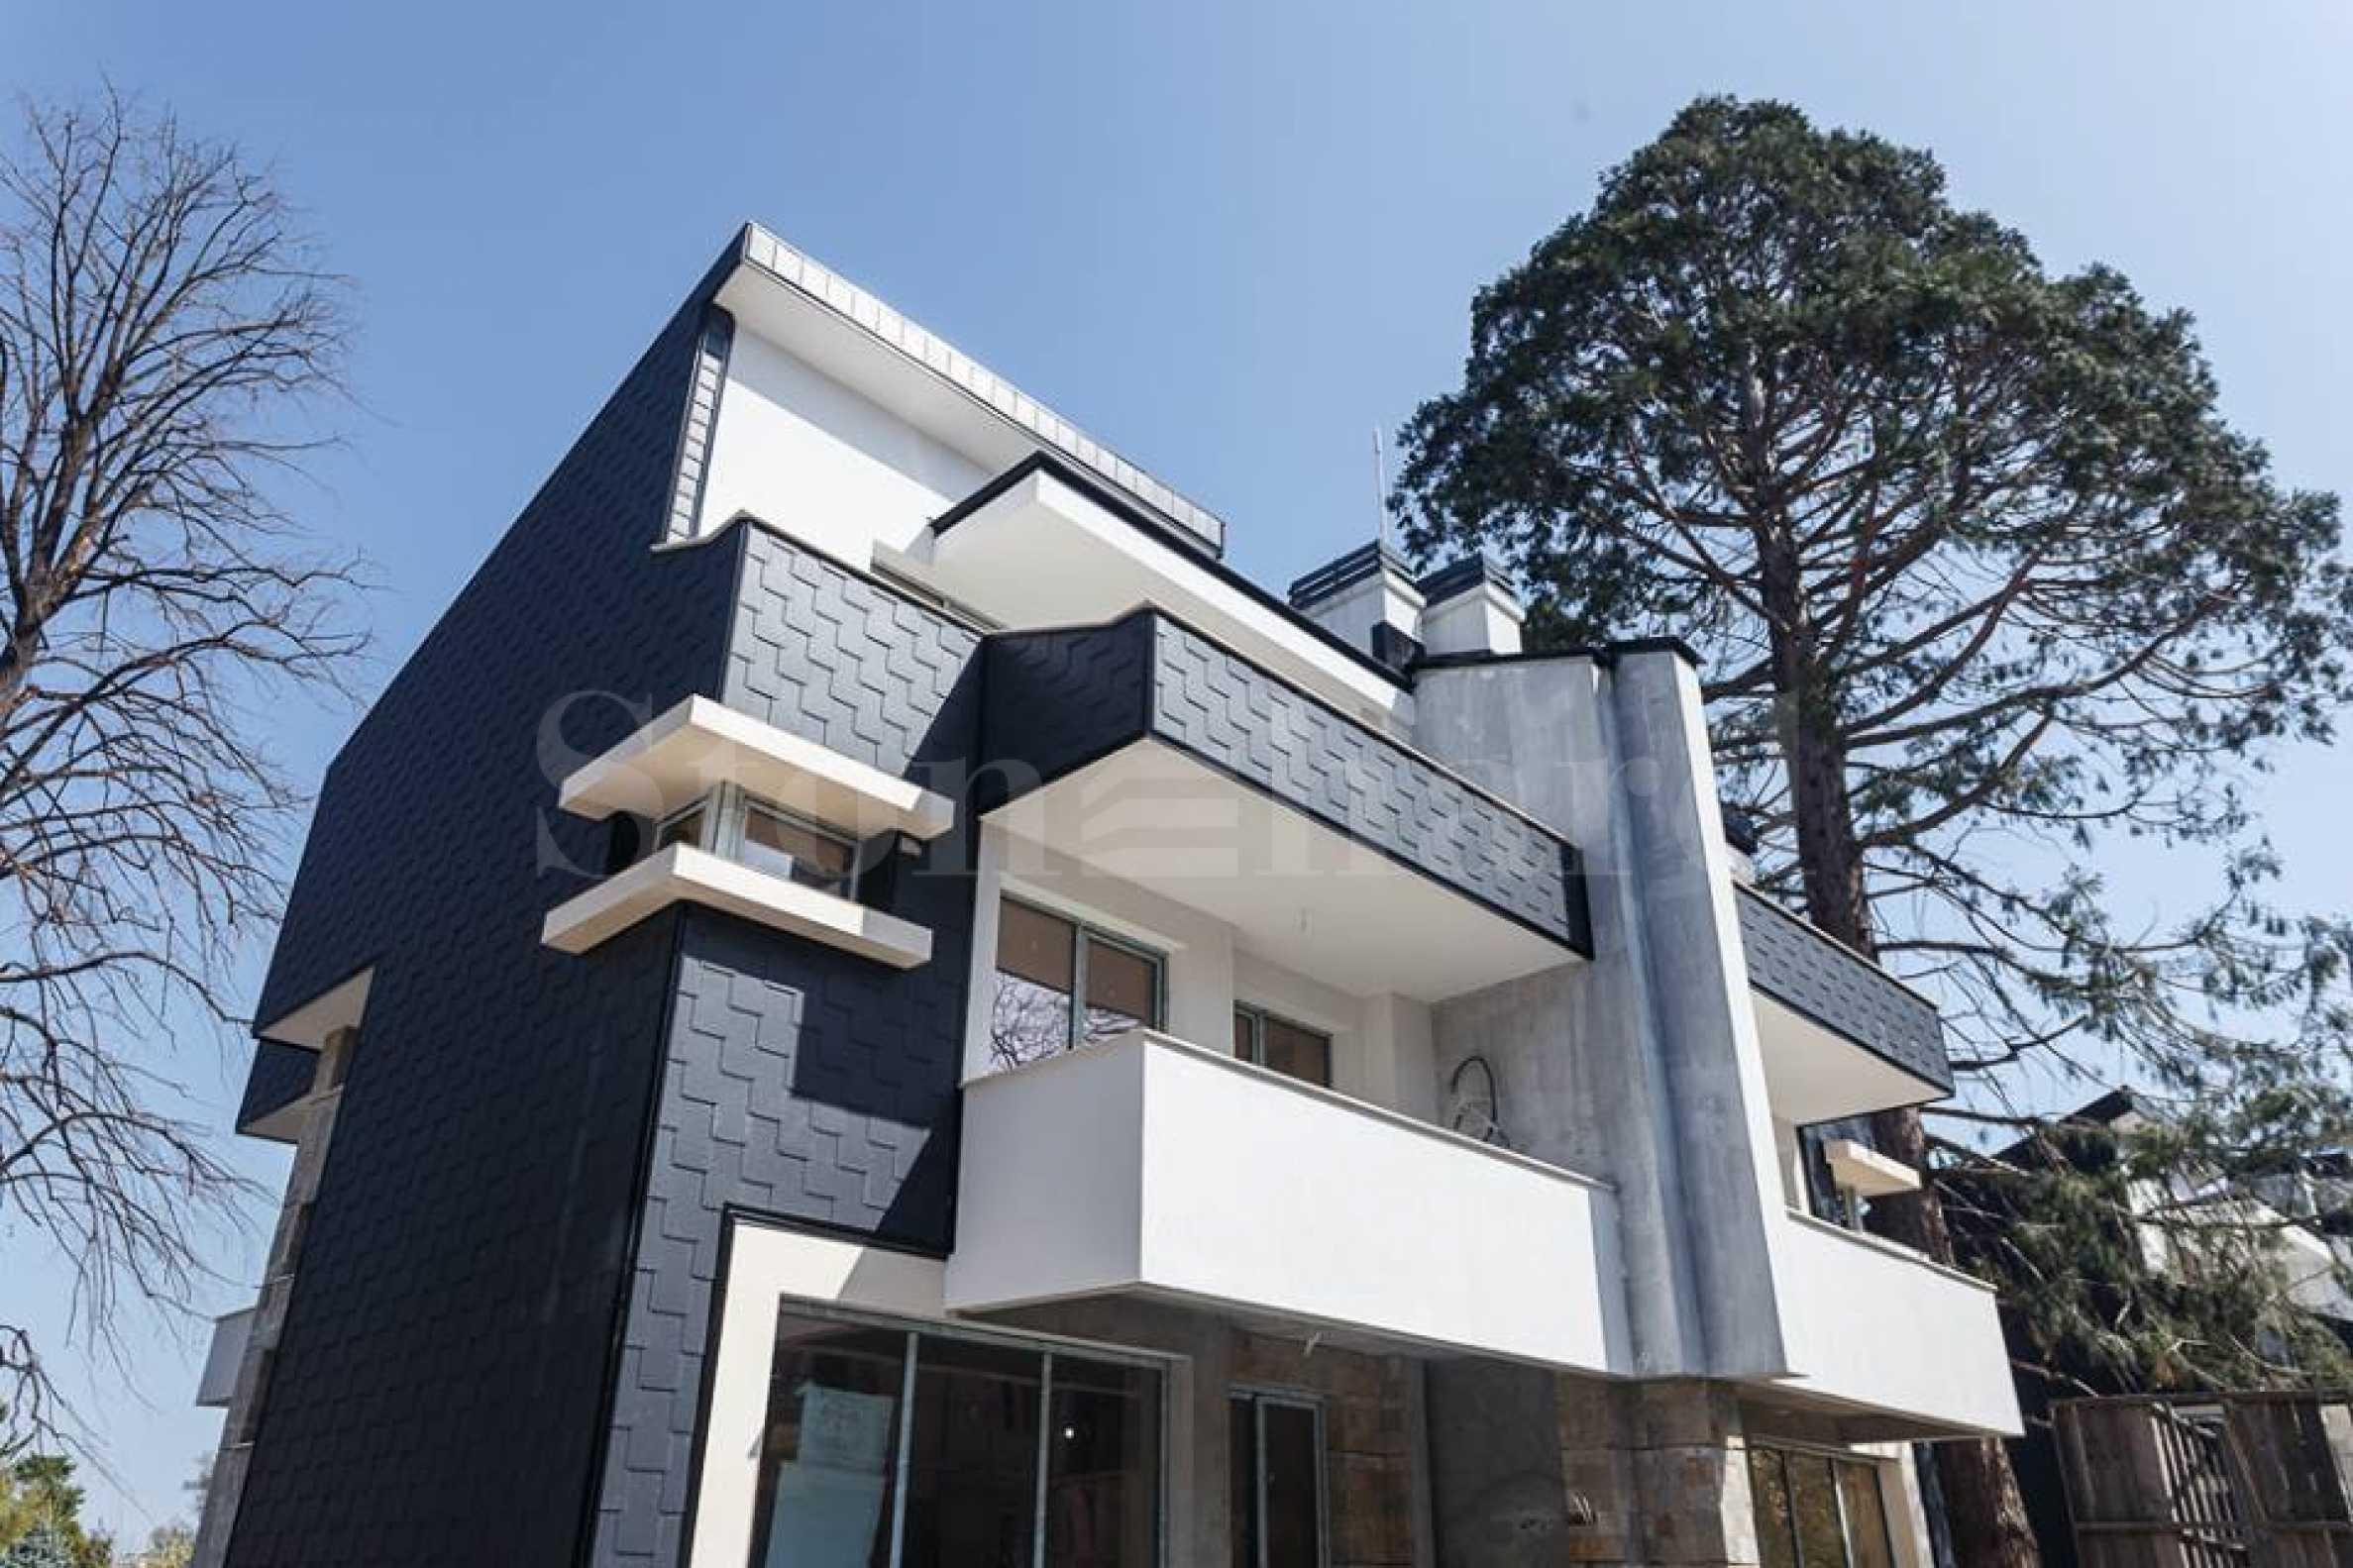 New-build houses in Sofia's Boyana district1 - Stonehard